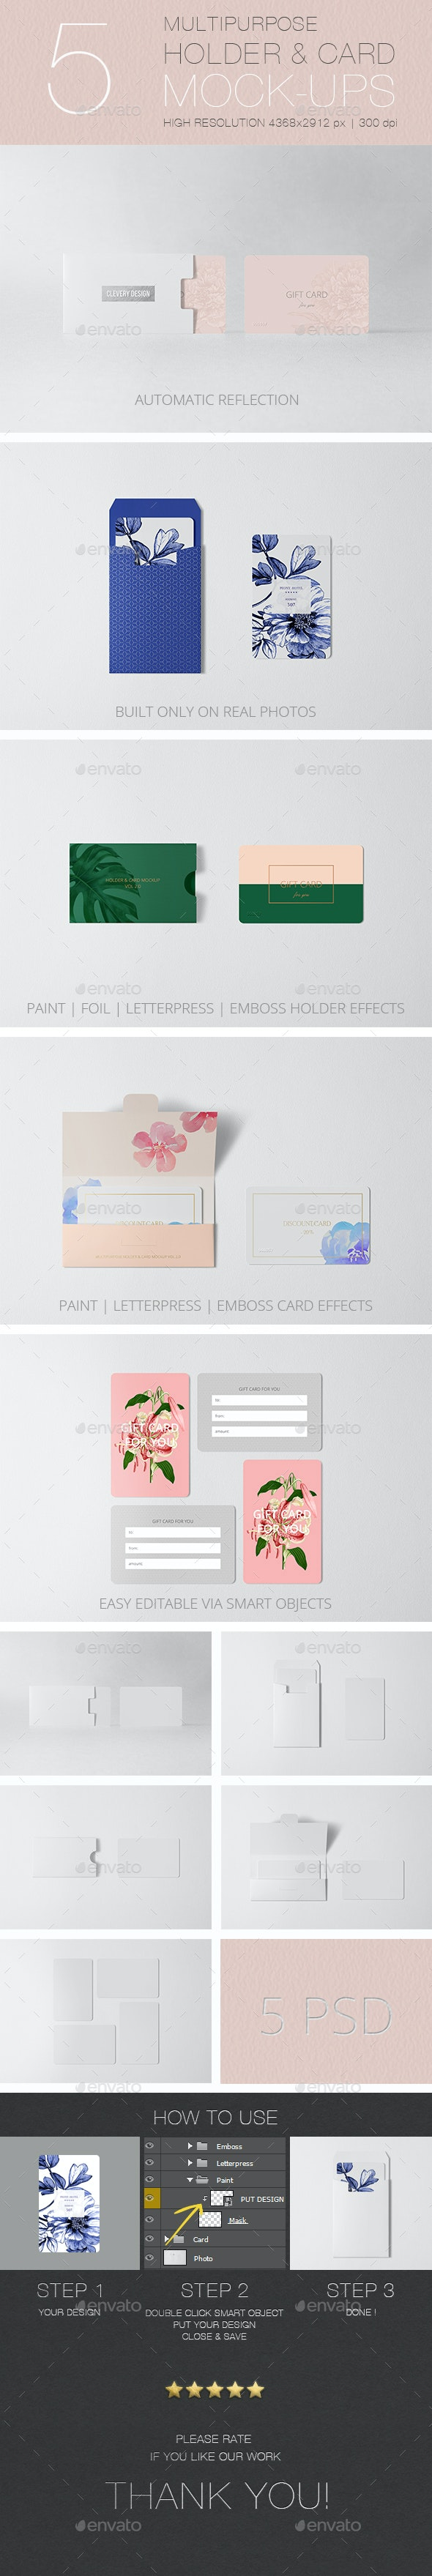 Multipurpose Holder & Card Mock-Up Vol 2.0 - Miscellaneous Print